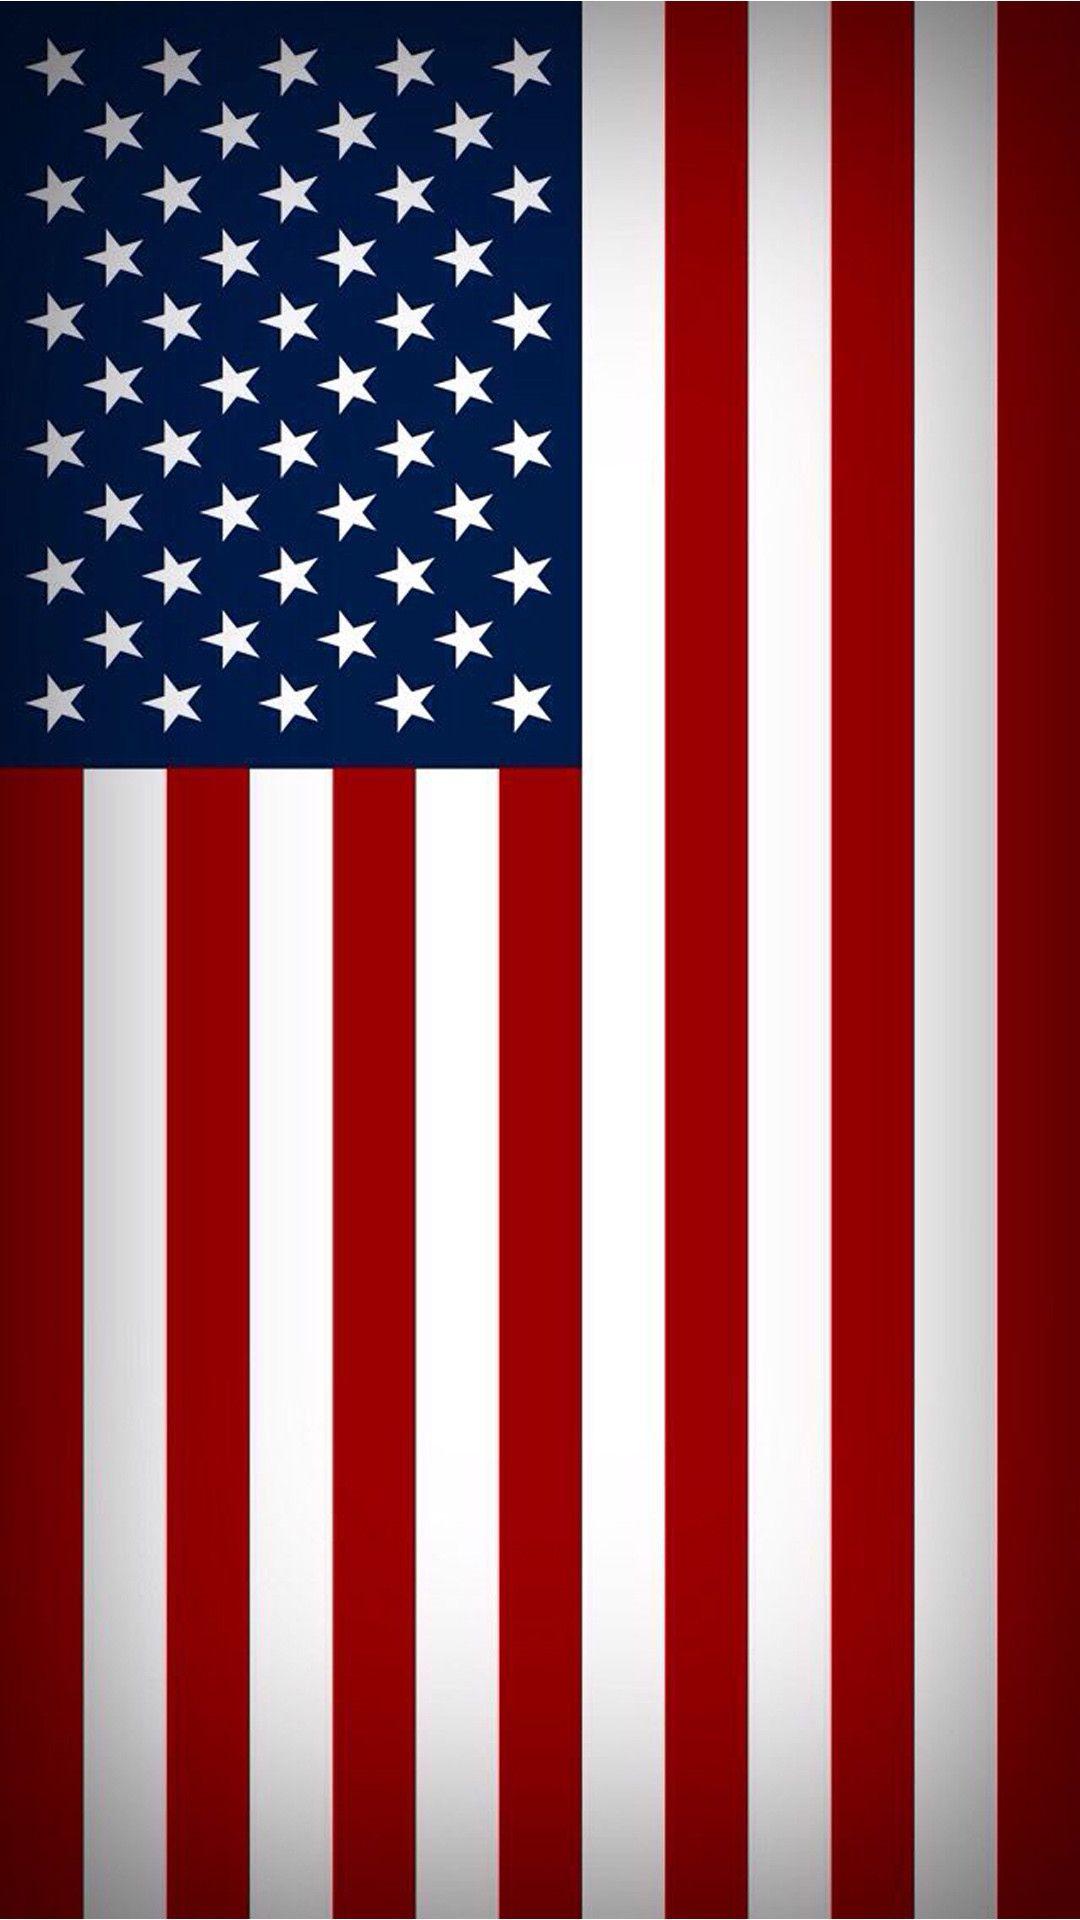 American Flag Wallpaper Iphone 6 62 Images American Flag Wallpaper American Flag Wallpaper Iphone Usa Flag Wallpaper